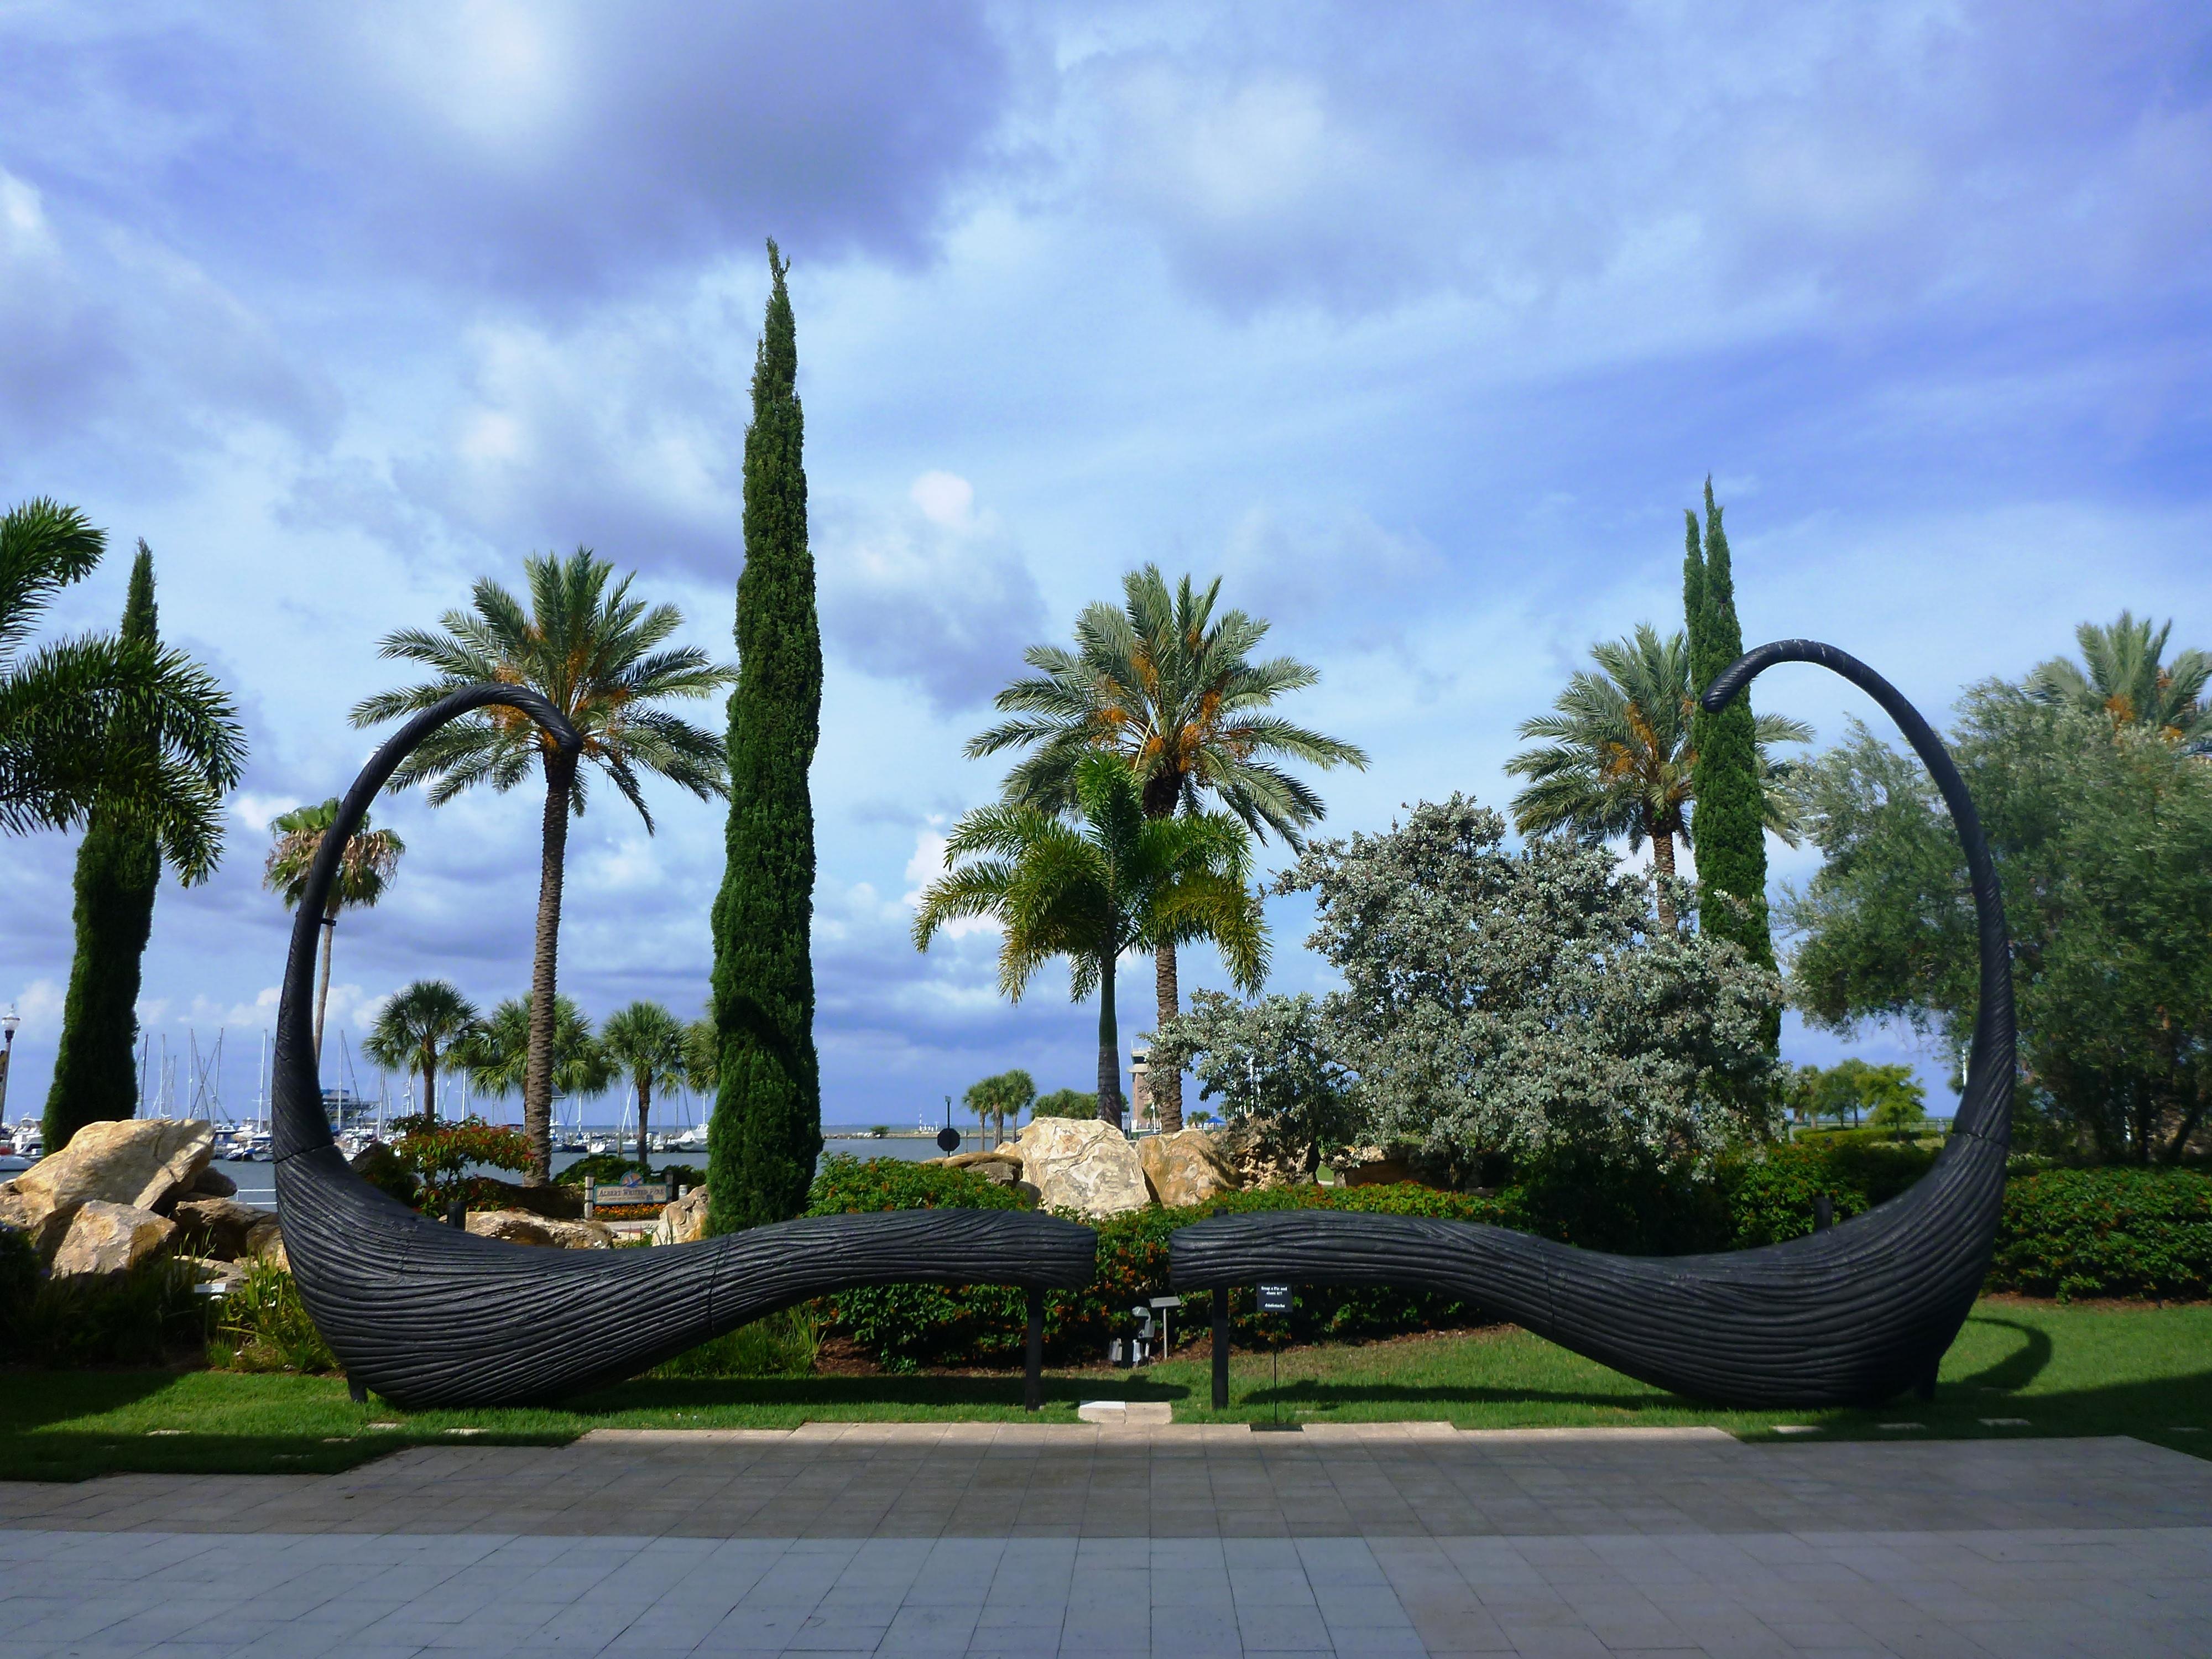 Salvador Dali The Greener Bench